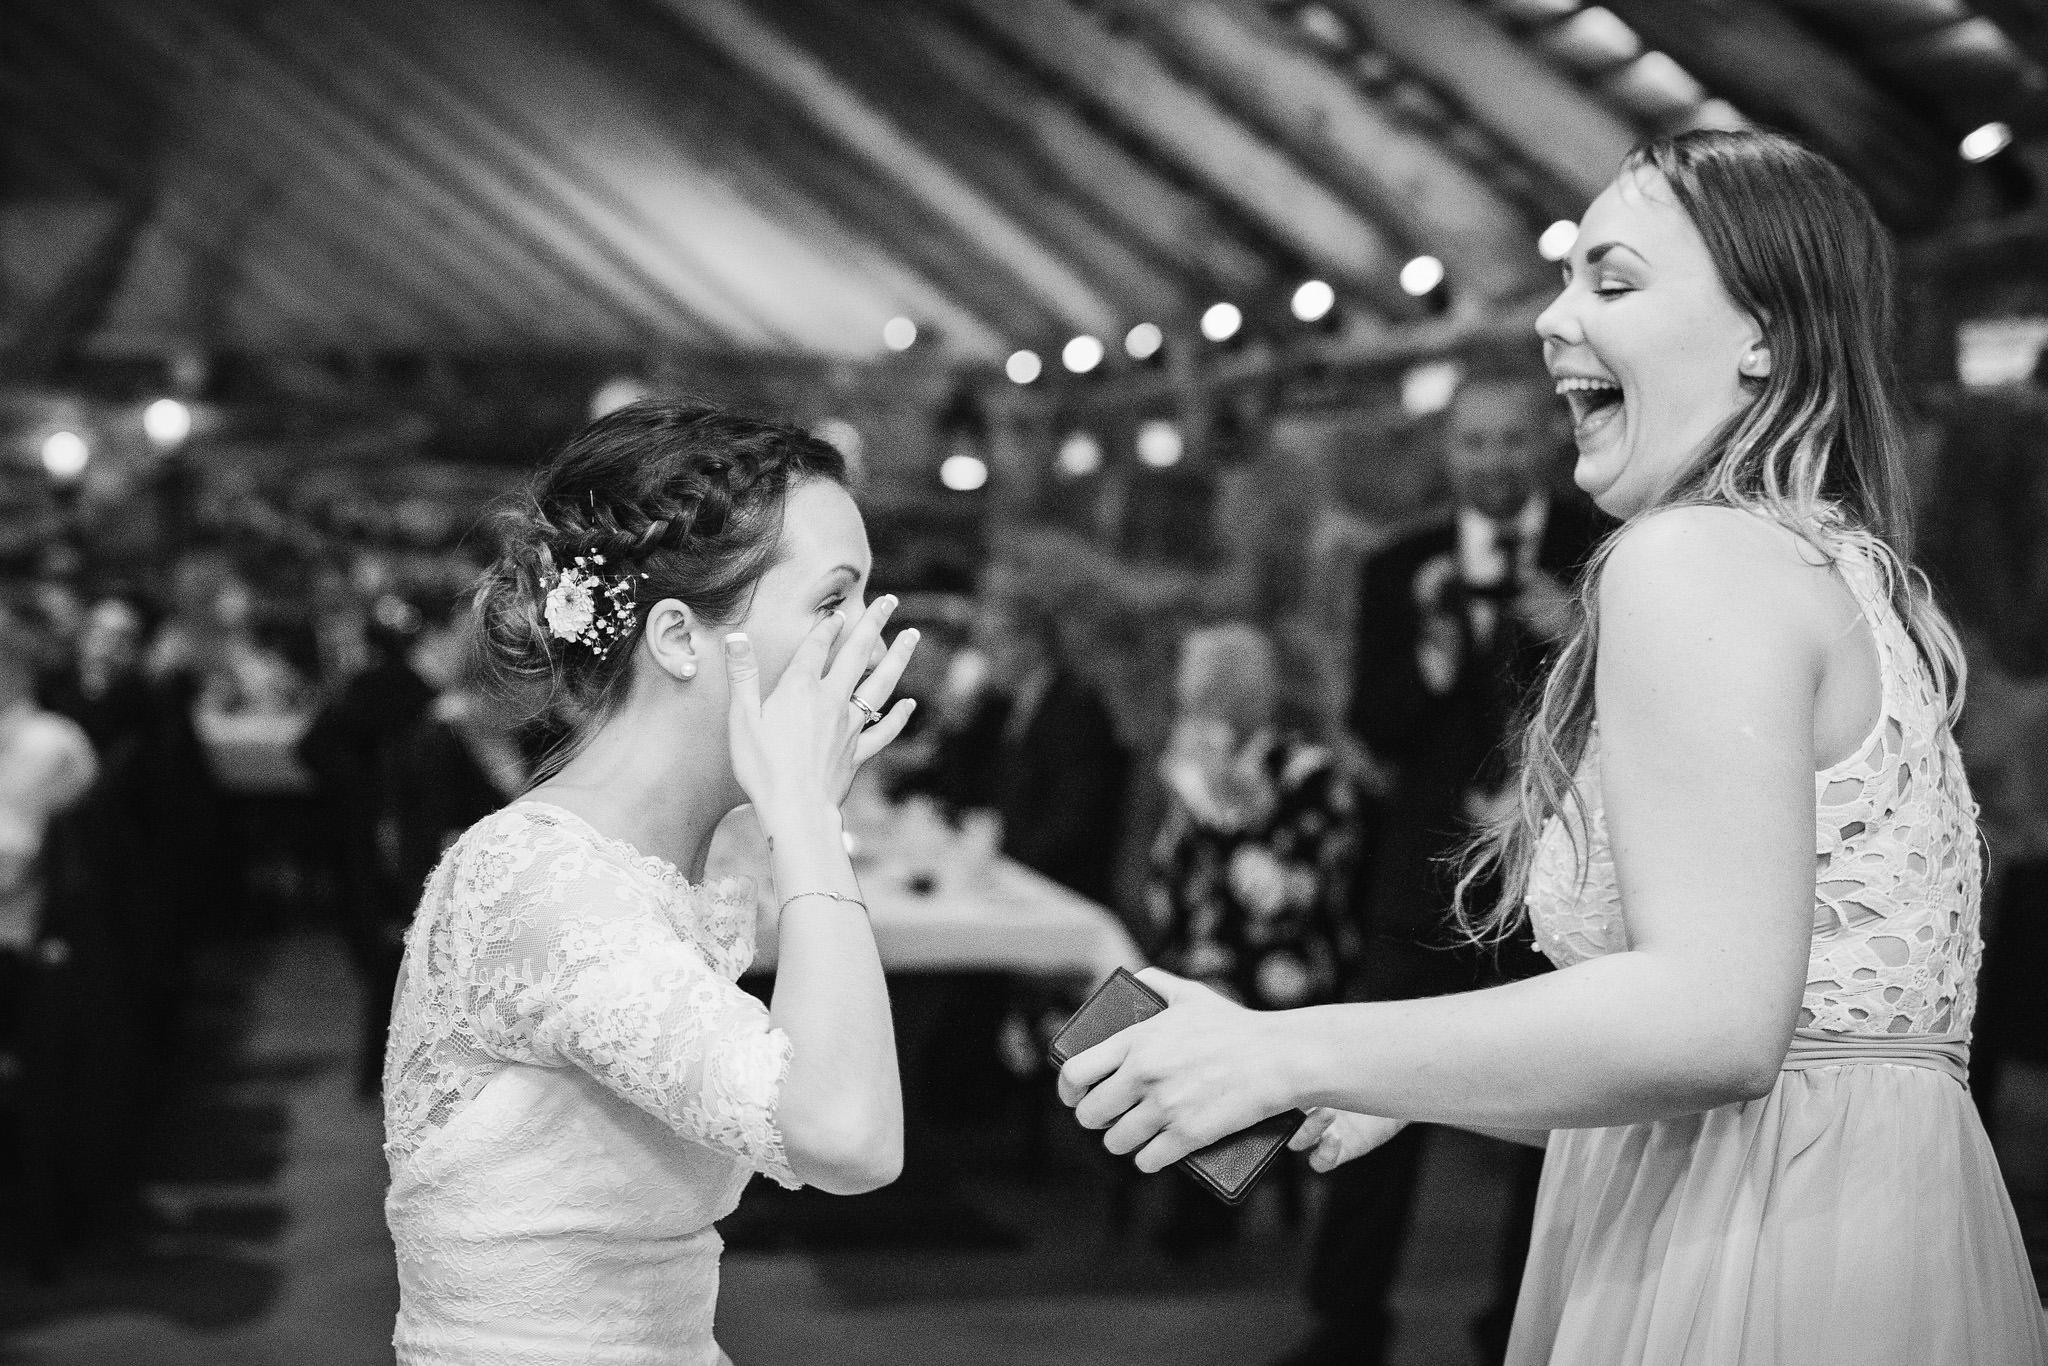 Norway+wedding+photographer+elopement+pre+wedding+Casey+Arneson-119.jpg